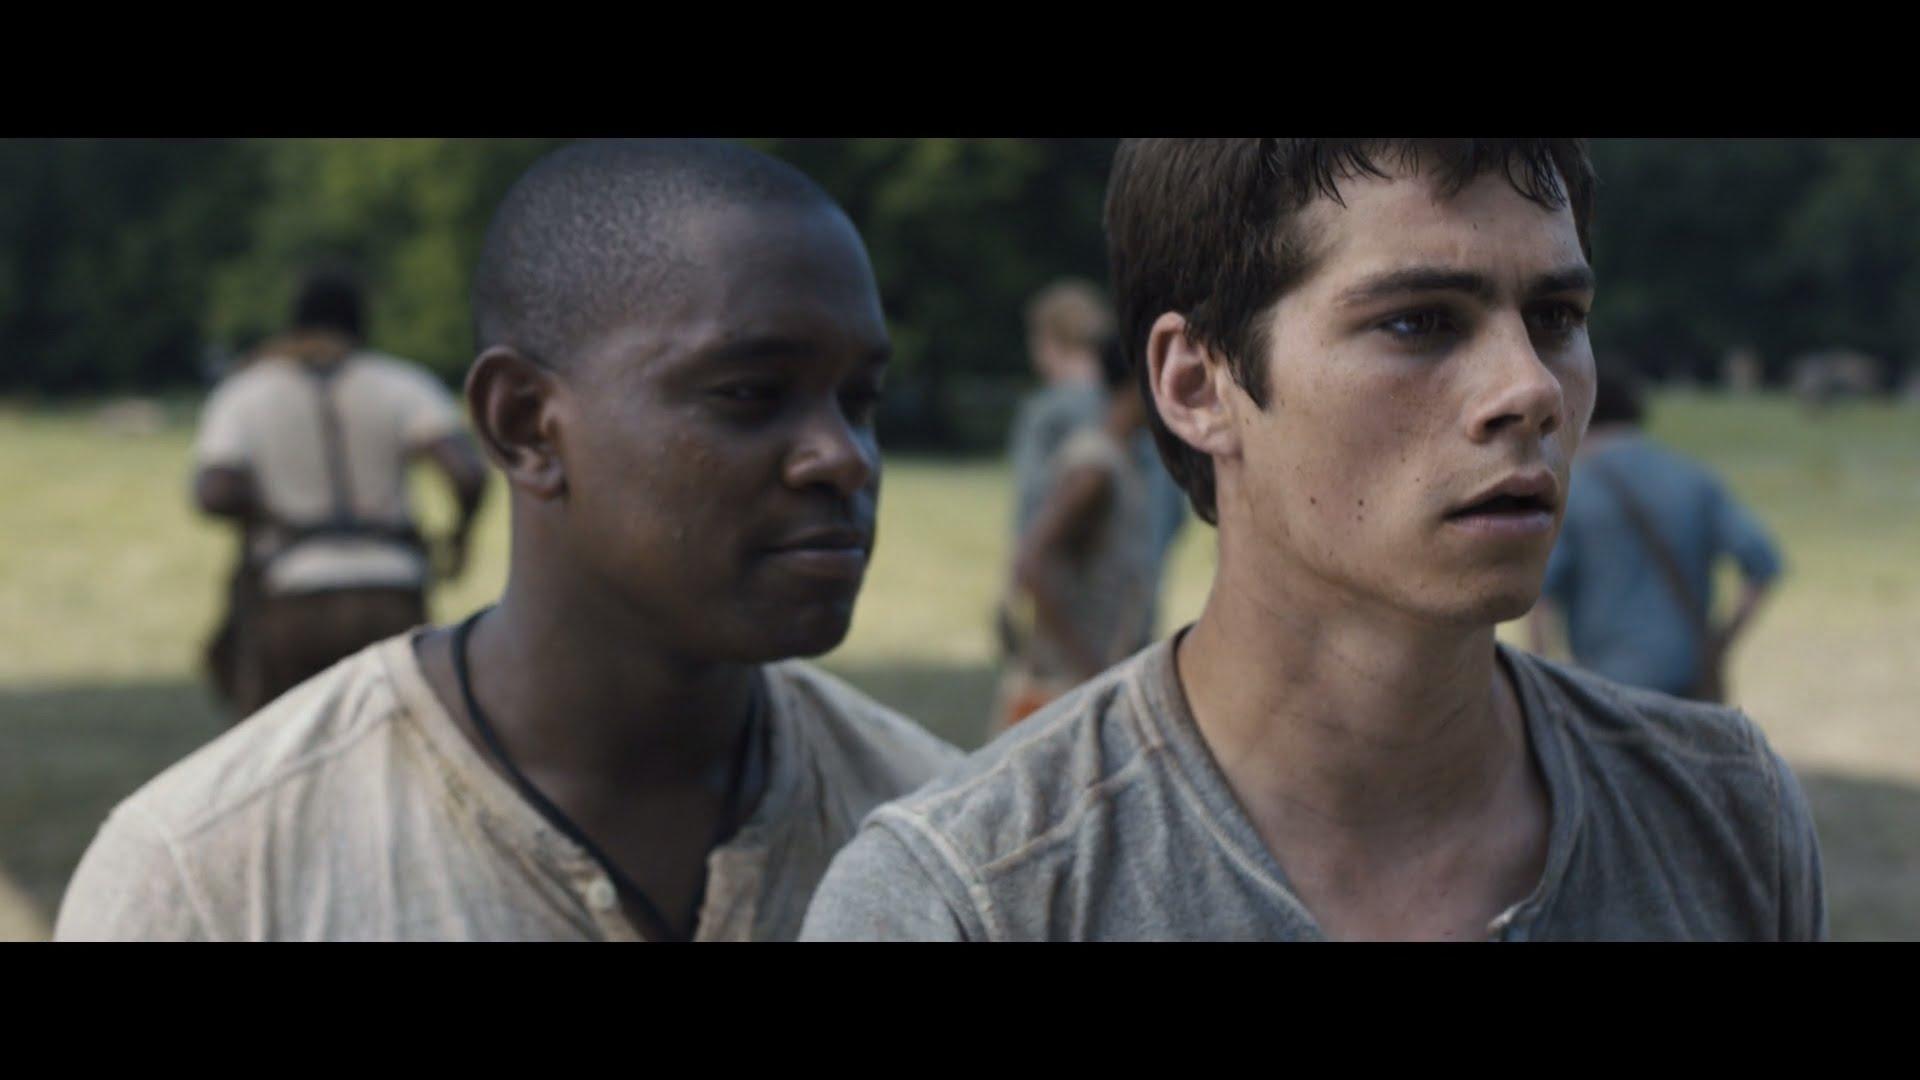 maxresdefaultDQCLPEFU The Maze Runner hat einen äußerst beklemmenden, neuen Trailer